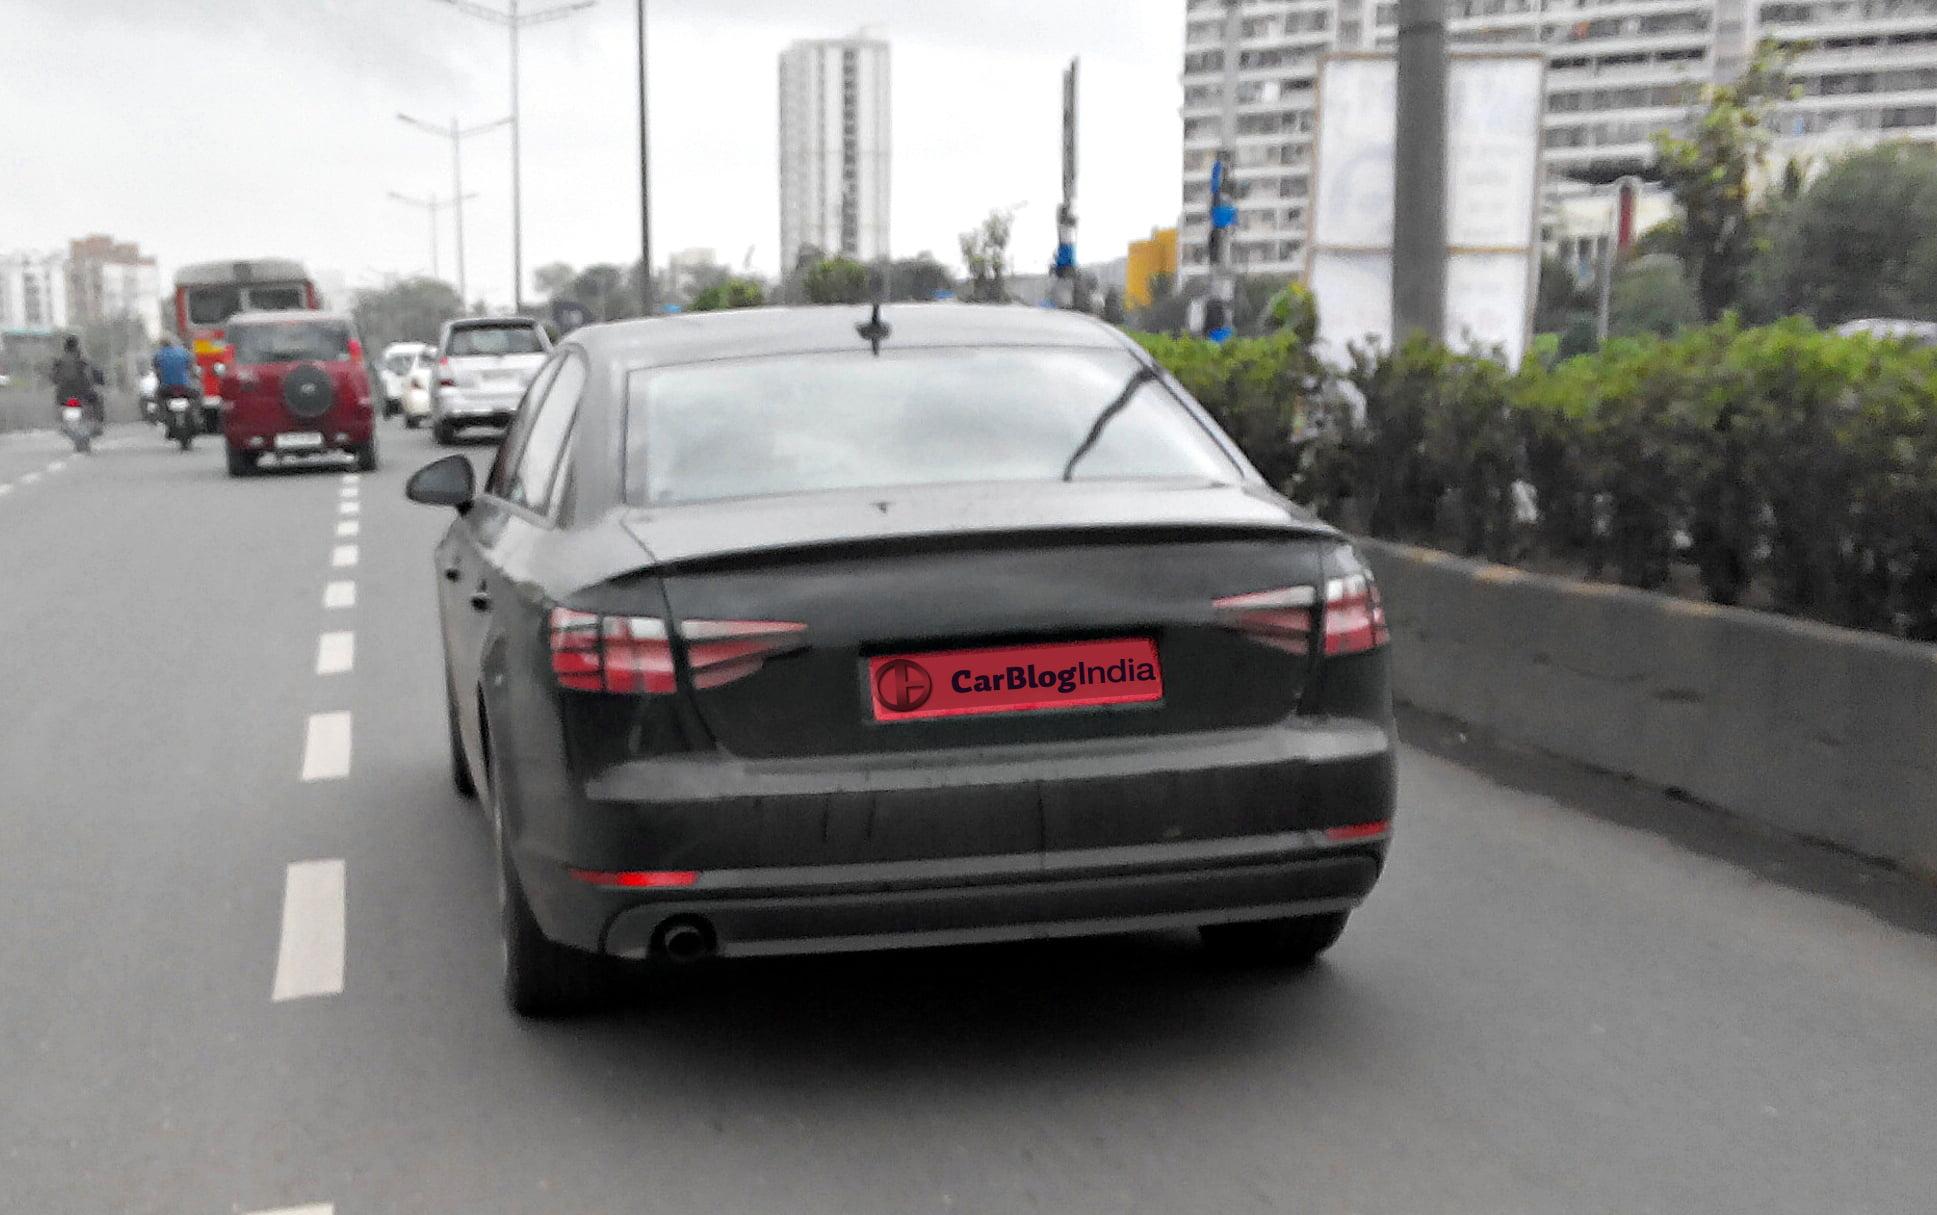 New Model 2016 Audi A4 India Price 38 Lakhs